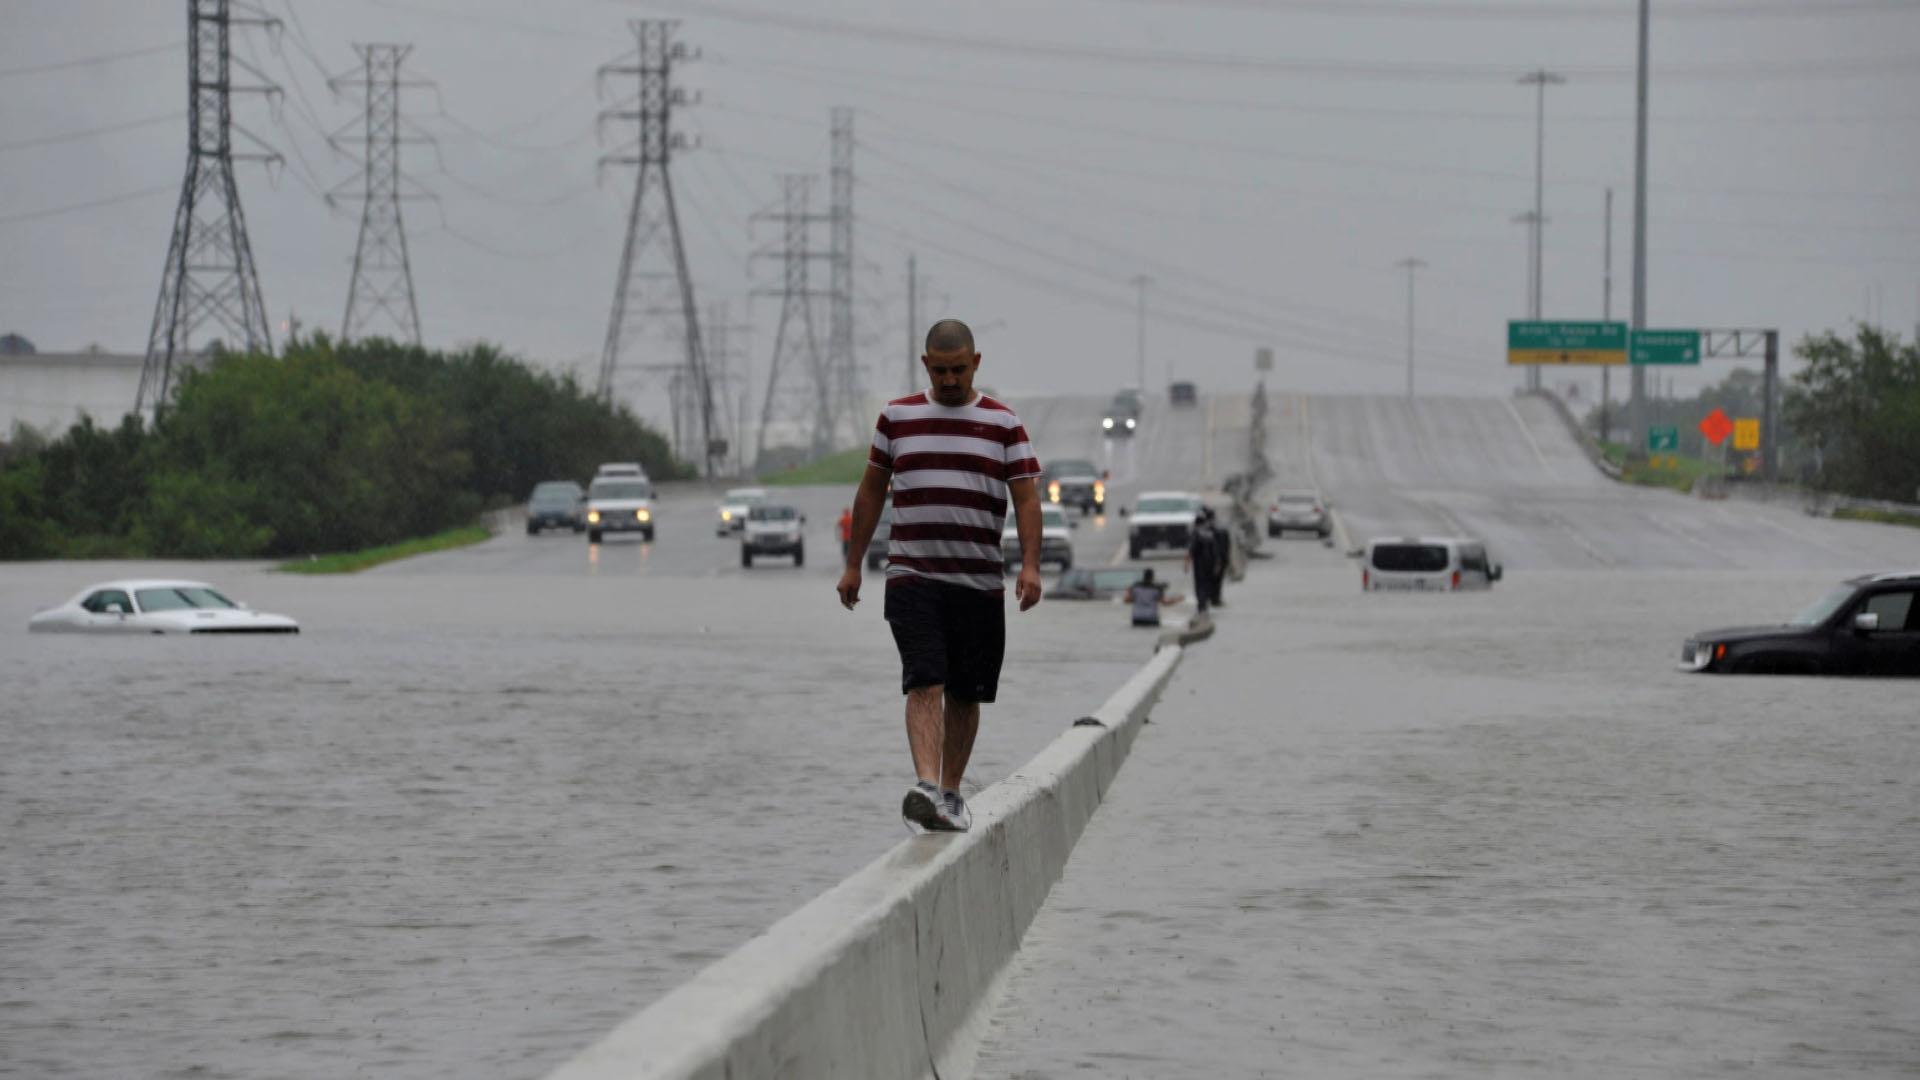 'Our Town Is Destroyed': Texans Face Hurricane Harvey Destruction